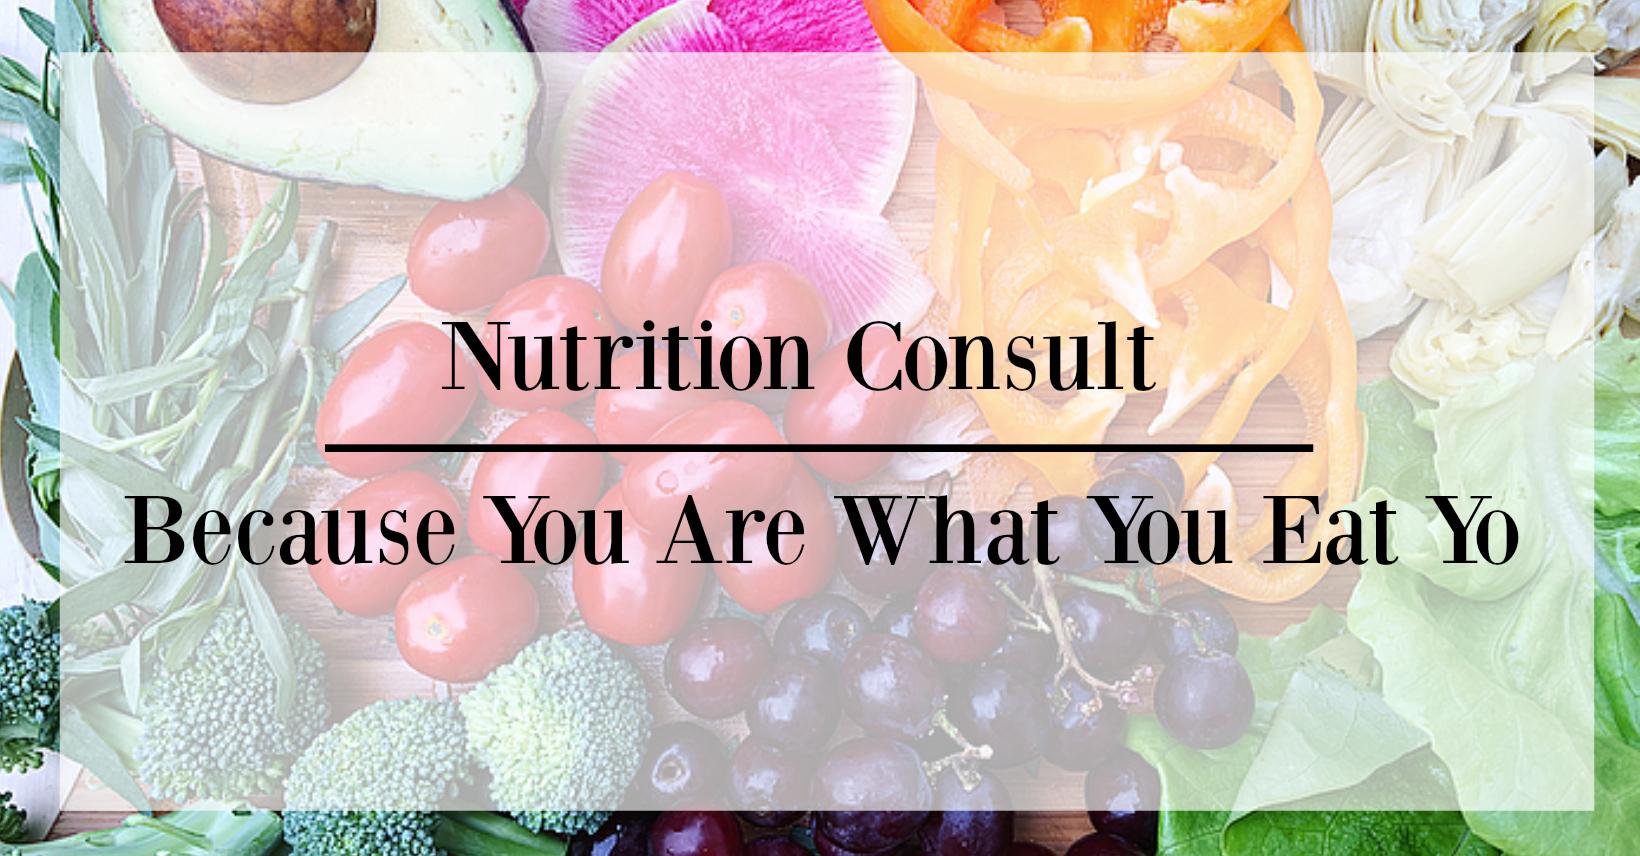 nutrition consult banner .jpg